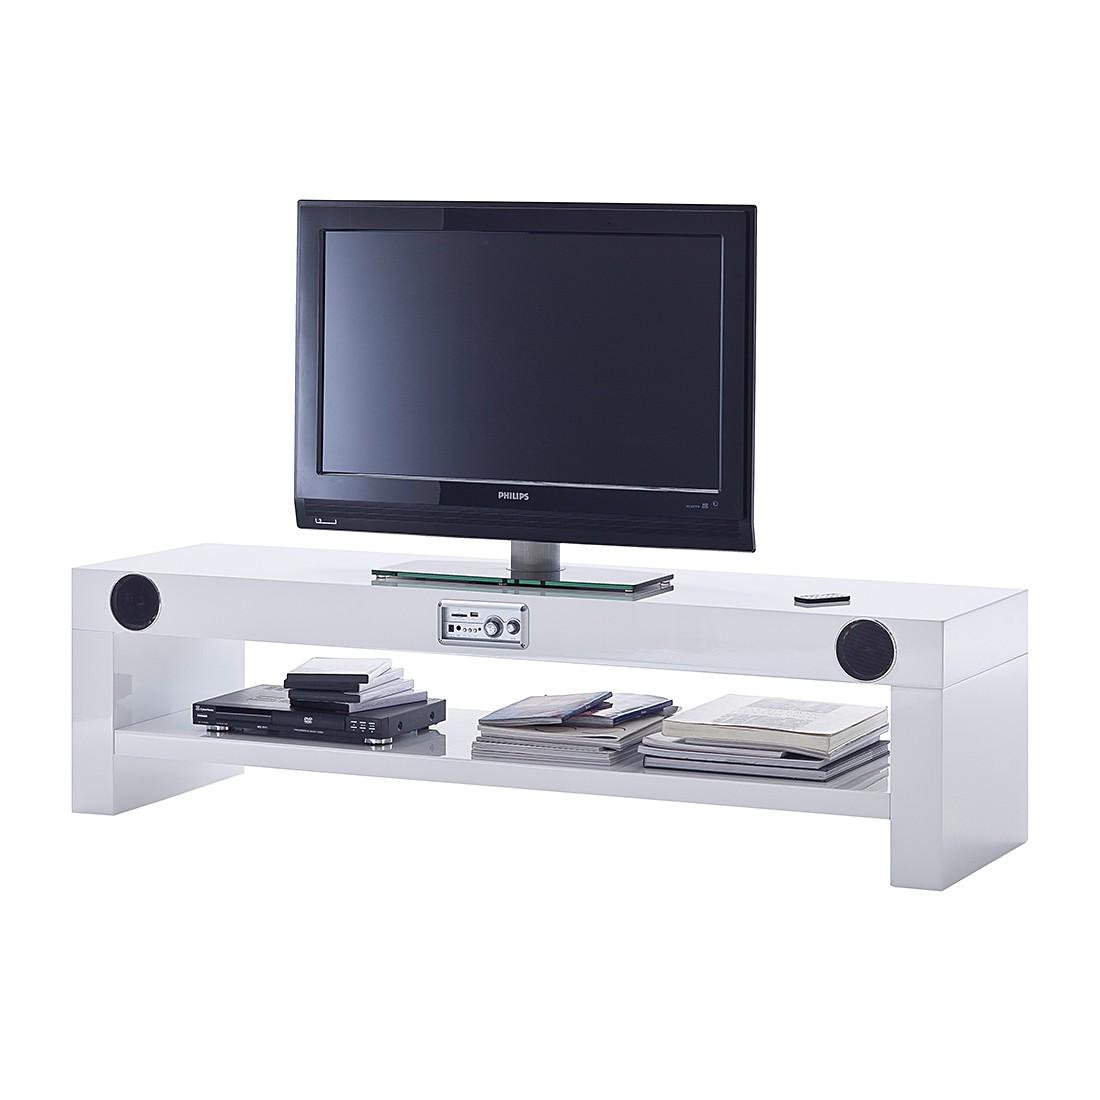 tv lowboard sound dock 2 lautsprecher 1 subwoofer hochglanz wei lackiert. Black Bedroom Furniture Sets. Home Design Ideas